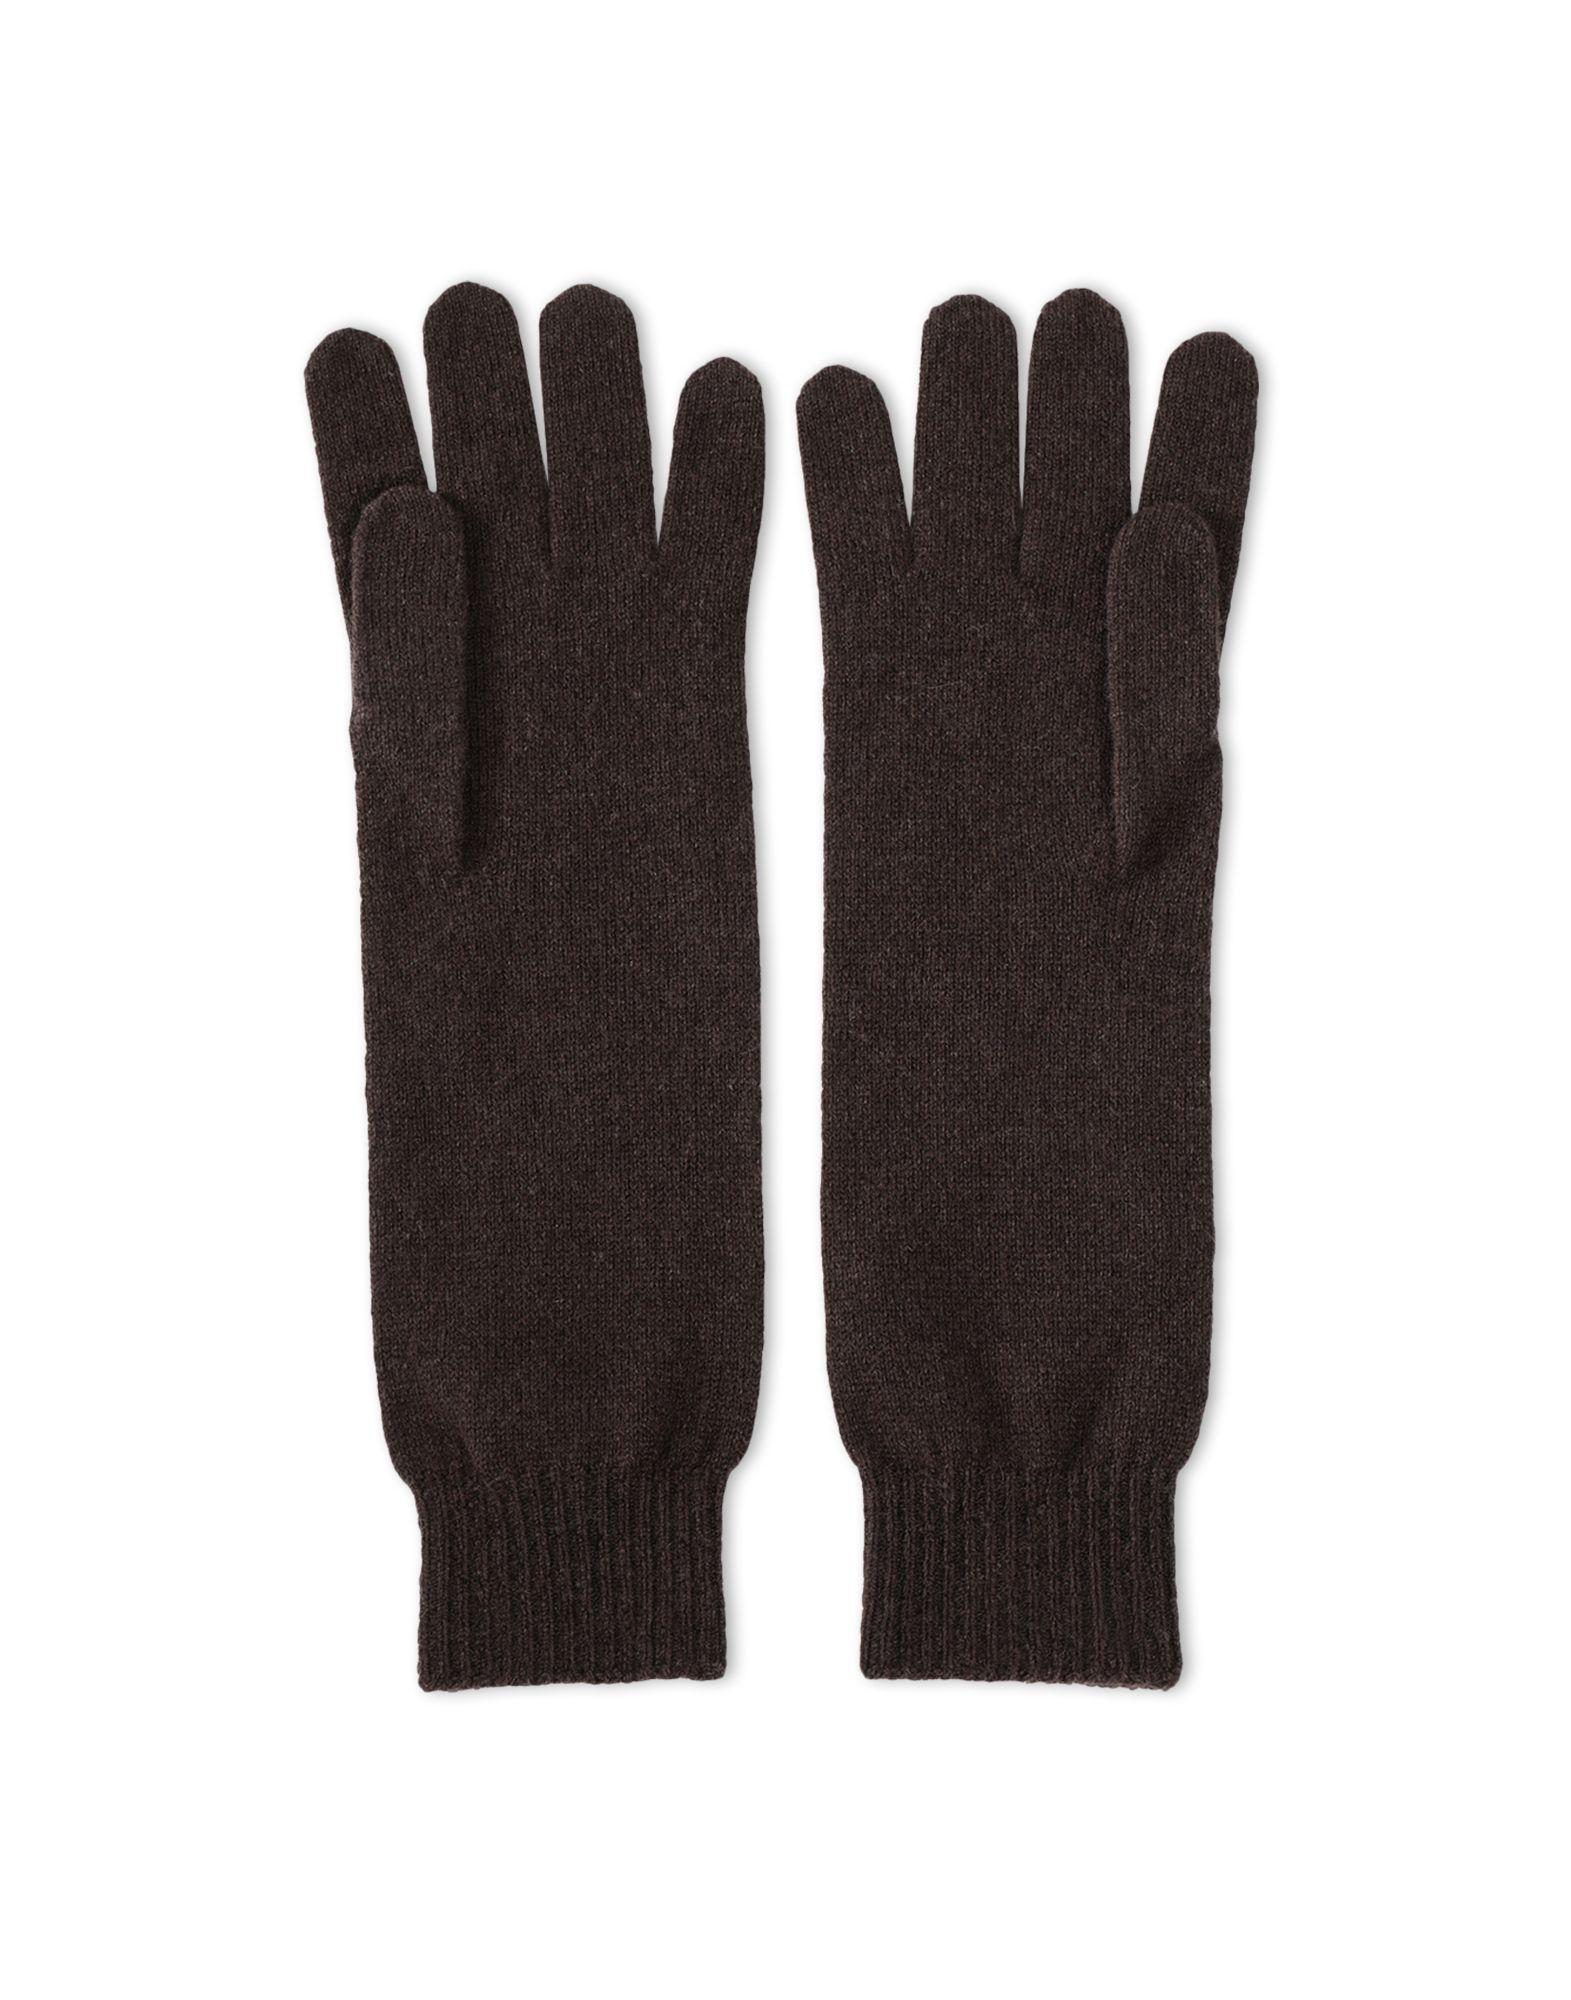 手袋 - JIL SANDER Online Store